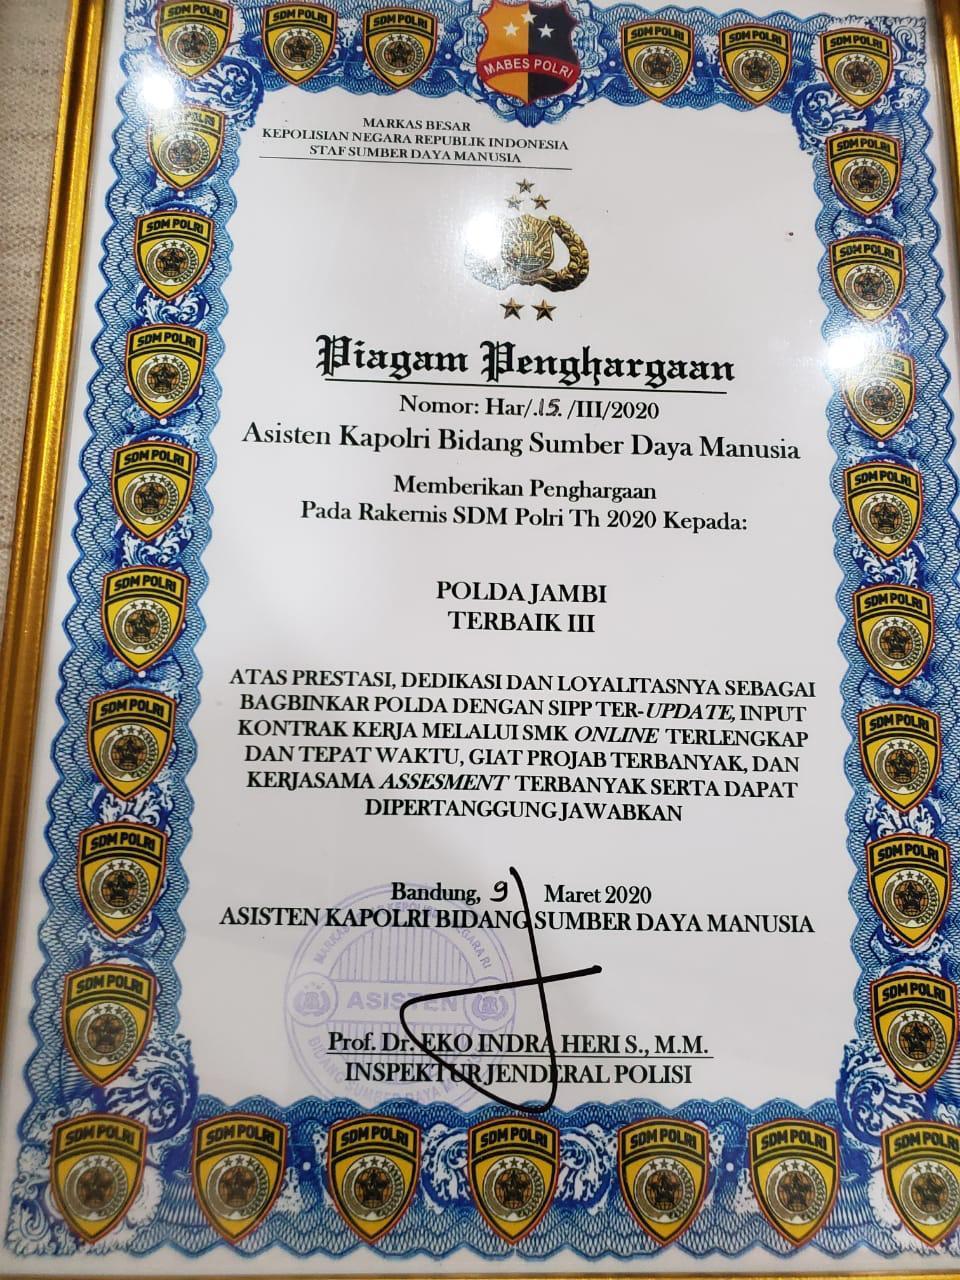 Mantab!! Polda Jambi Terima Piagam Penghargaan Dari Asisten Kapolri Bidang Sumber Daya Manusia Tahun 2020